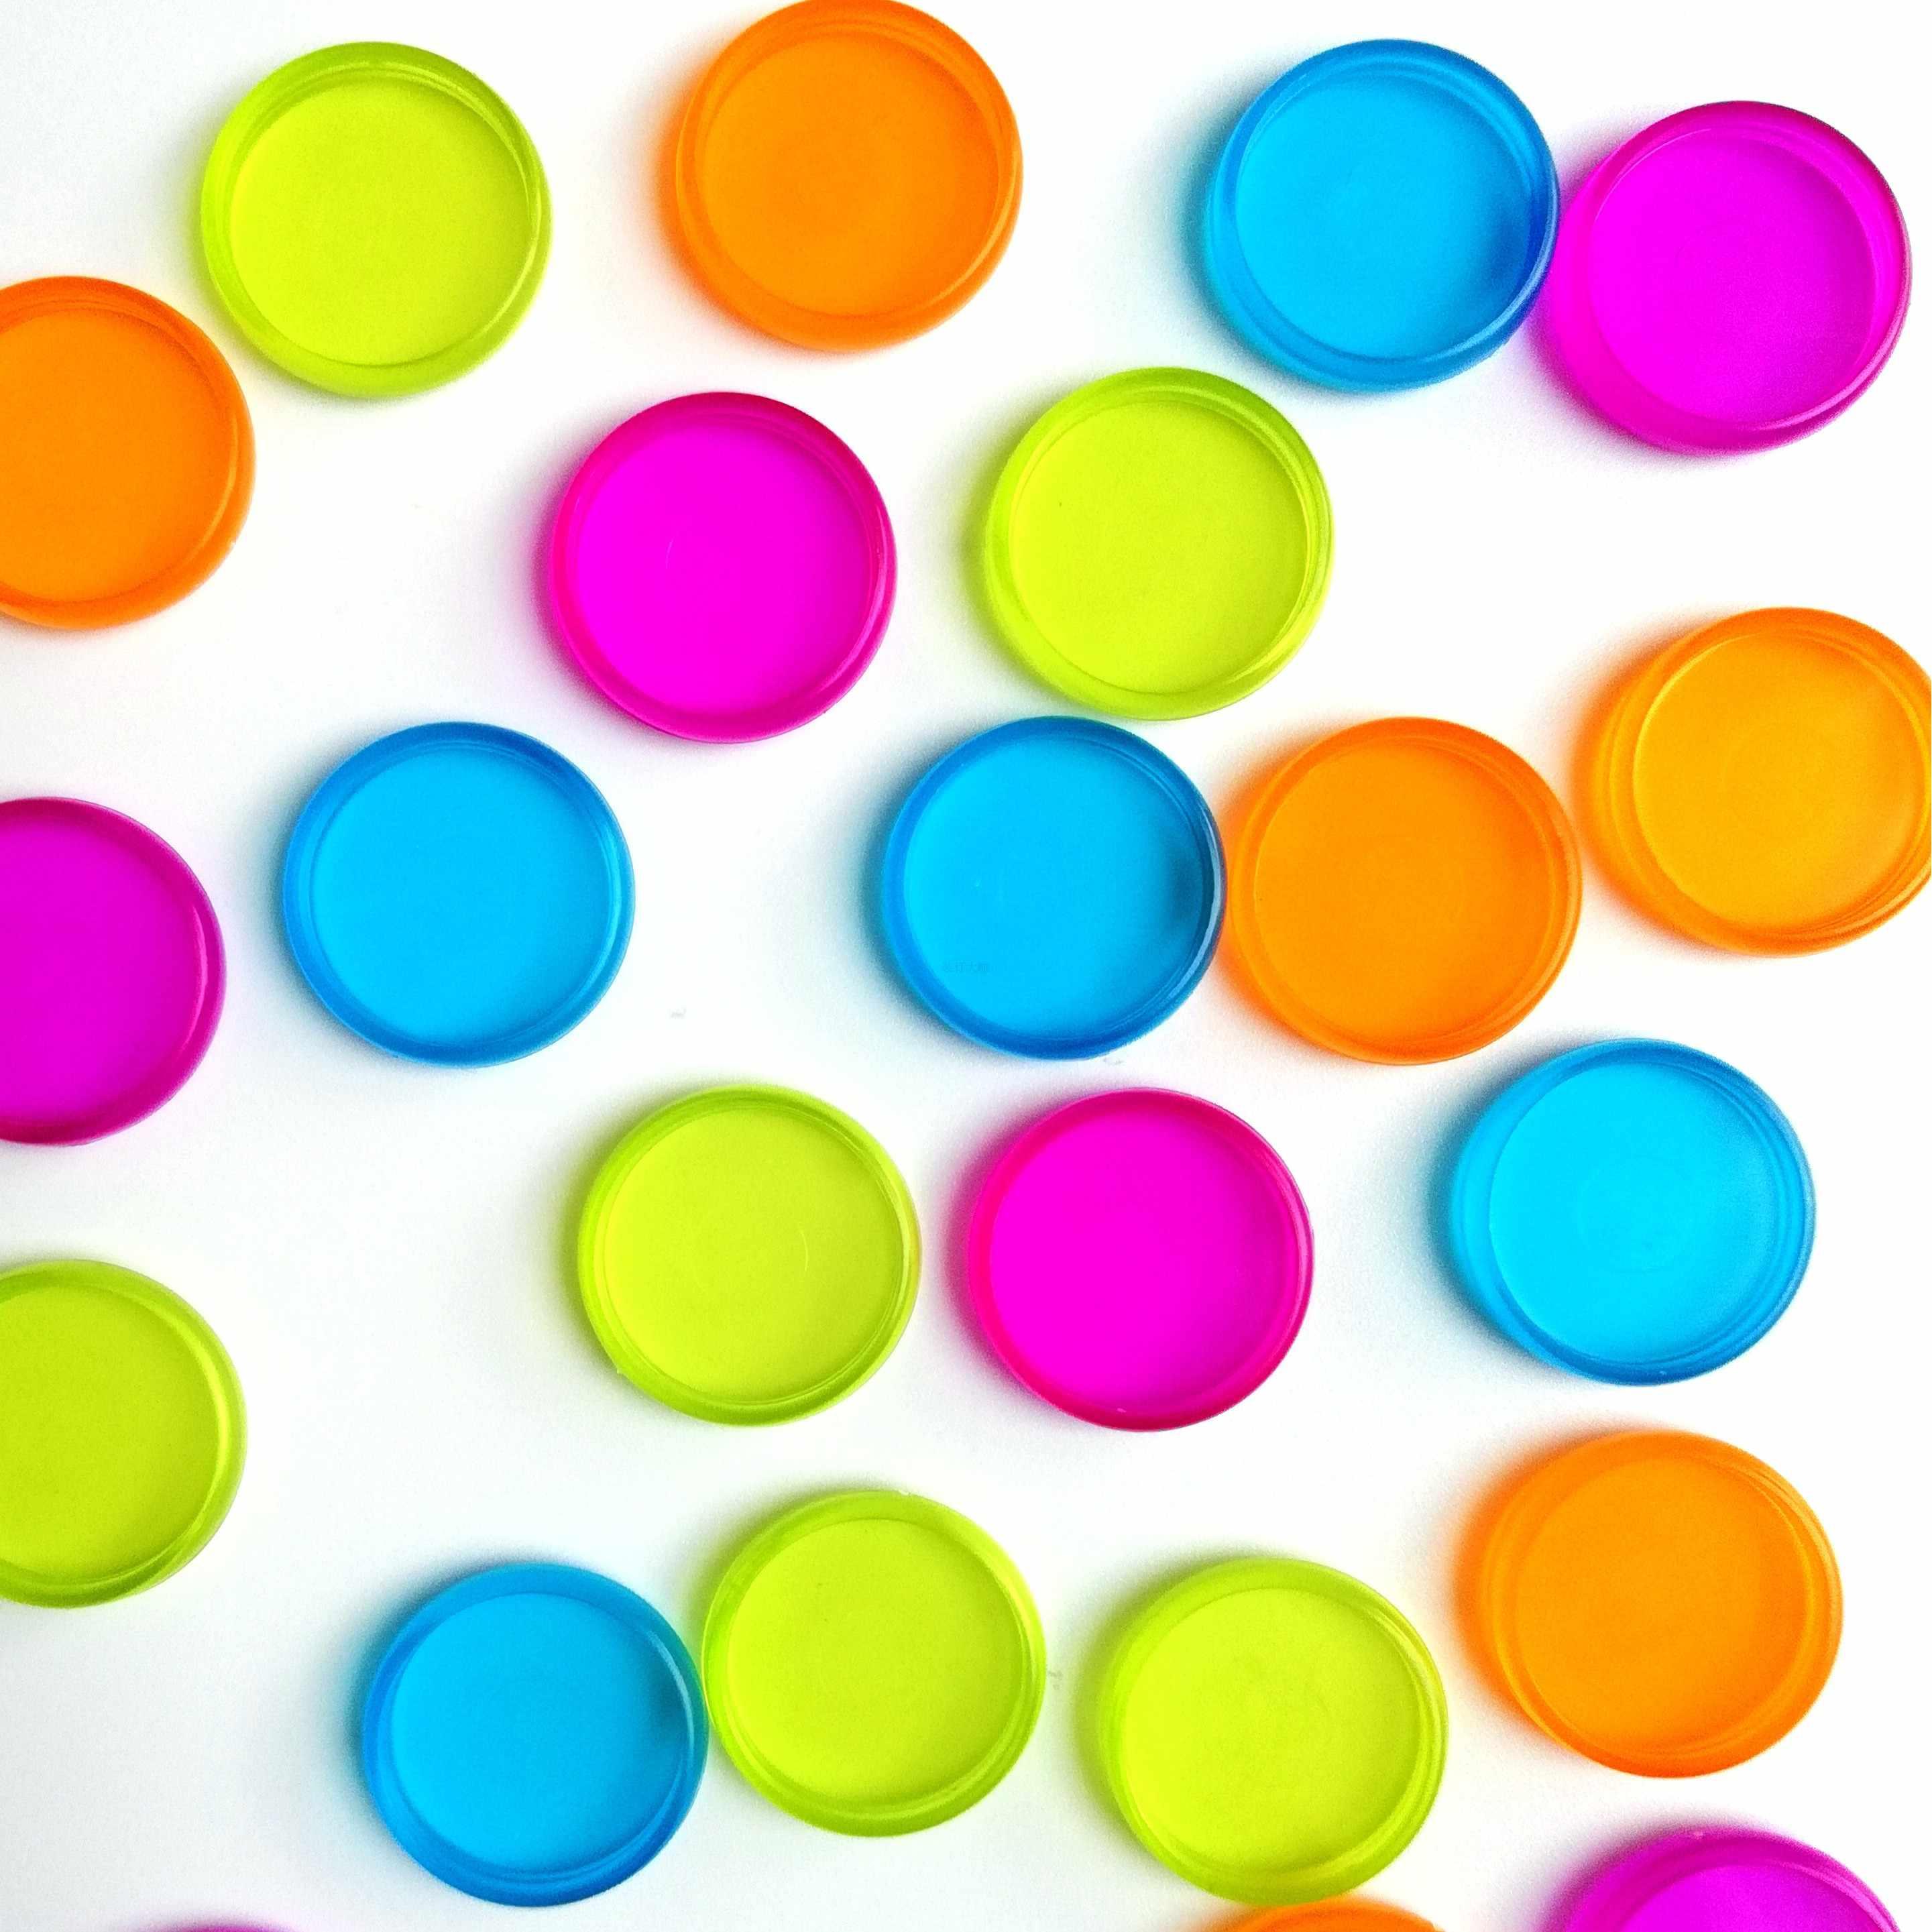 30Pcs Kleurrijke Plastic Disc Binding Ring Losse Blad T Paddestoel Gat Arc Binding Boek Ringen voor DIY Notebook Bindmiddel office Supply